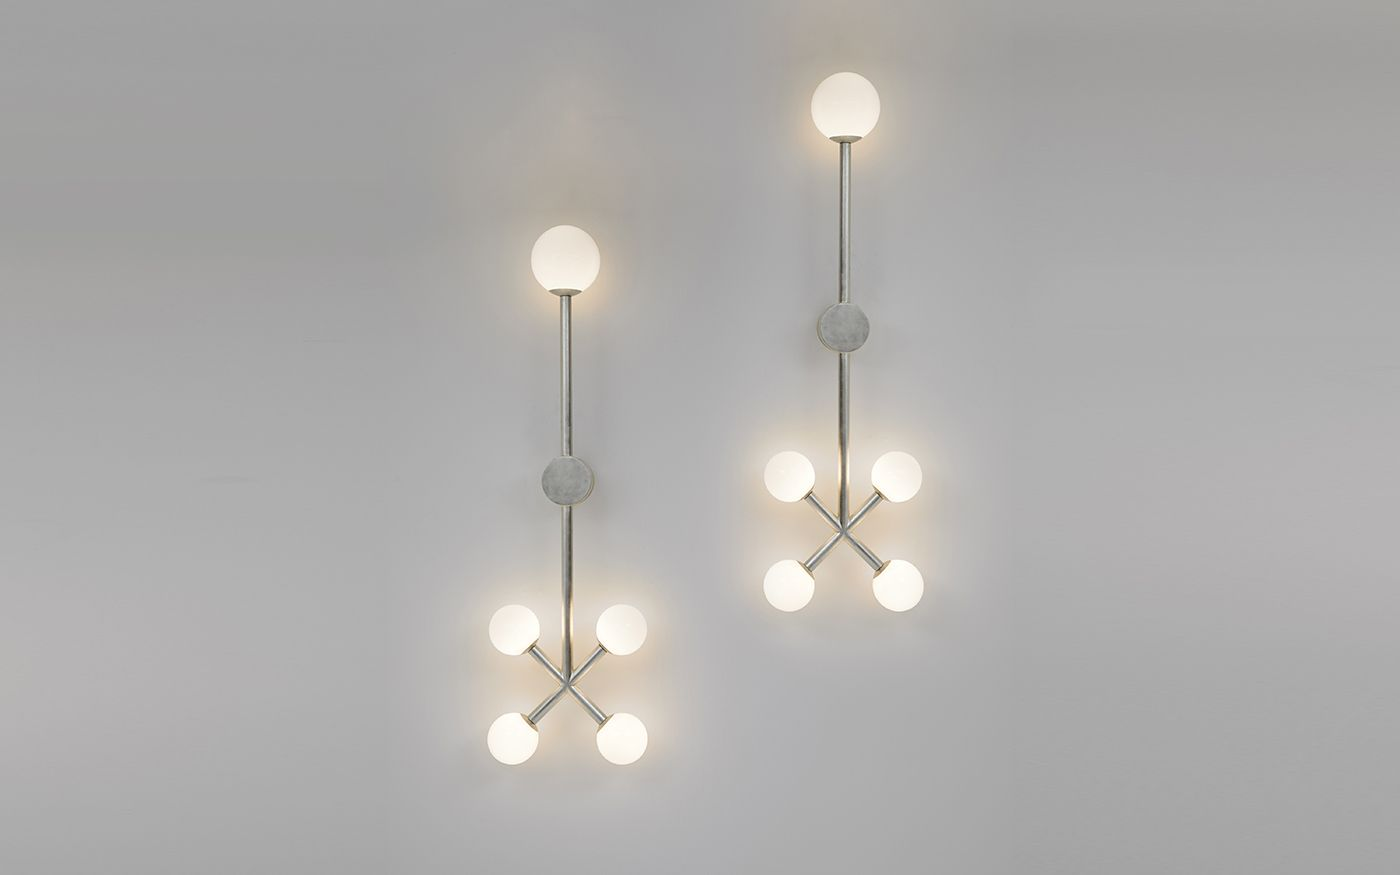 Design miami 2017 design miami lighting design denver sconces light fixtures